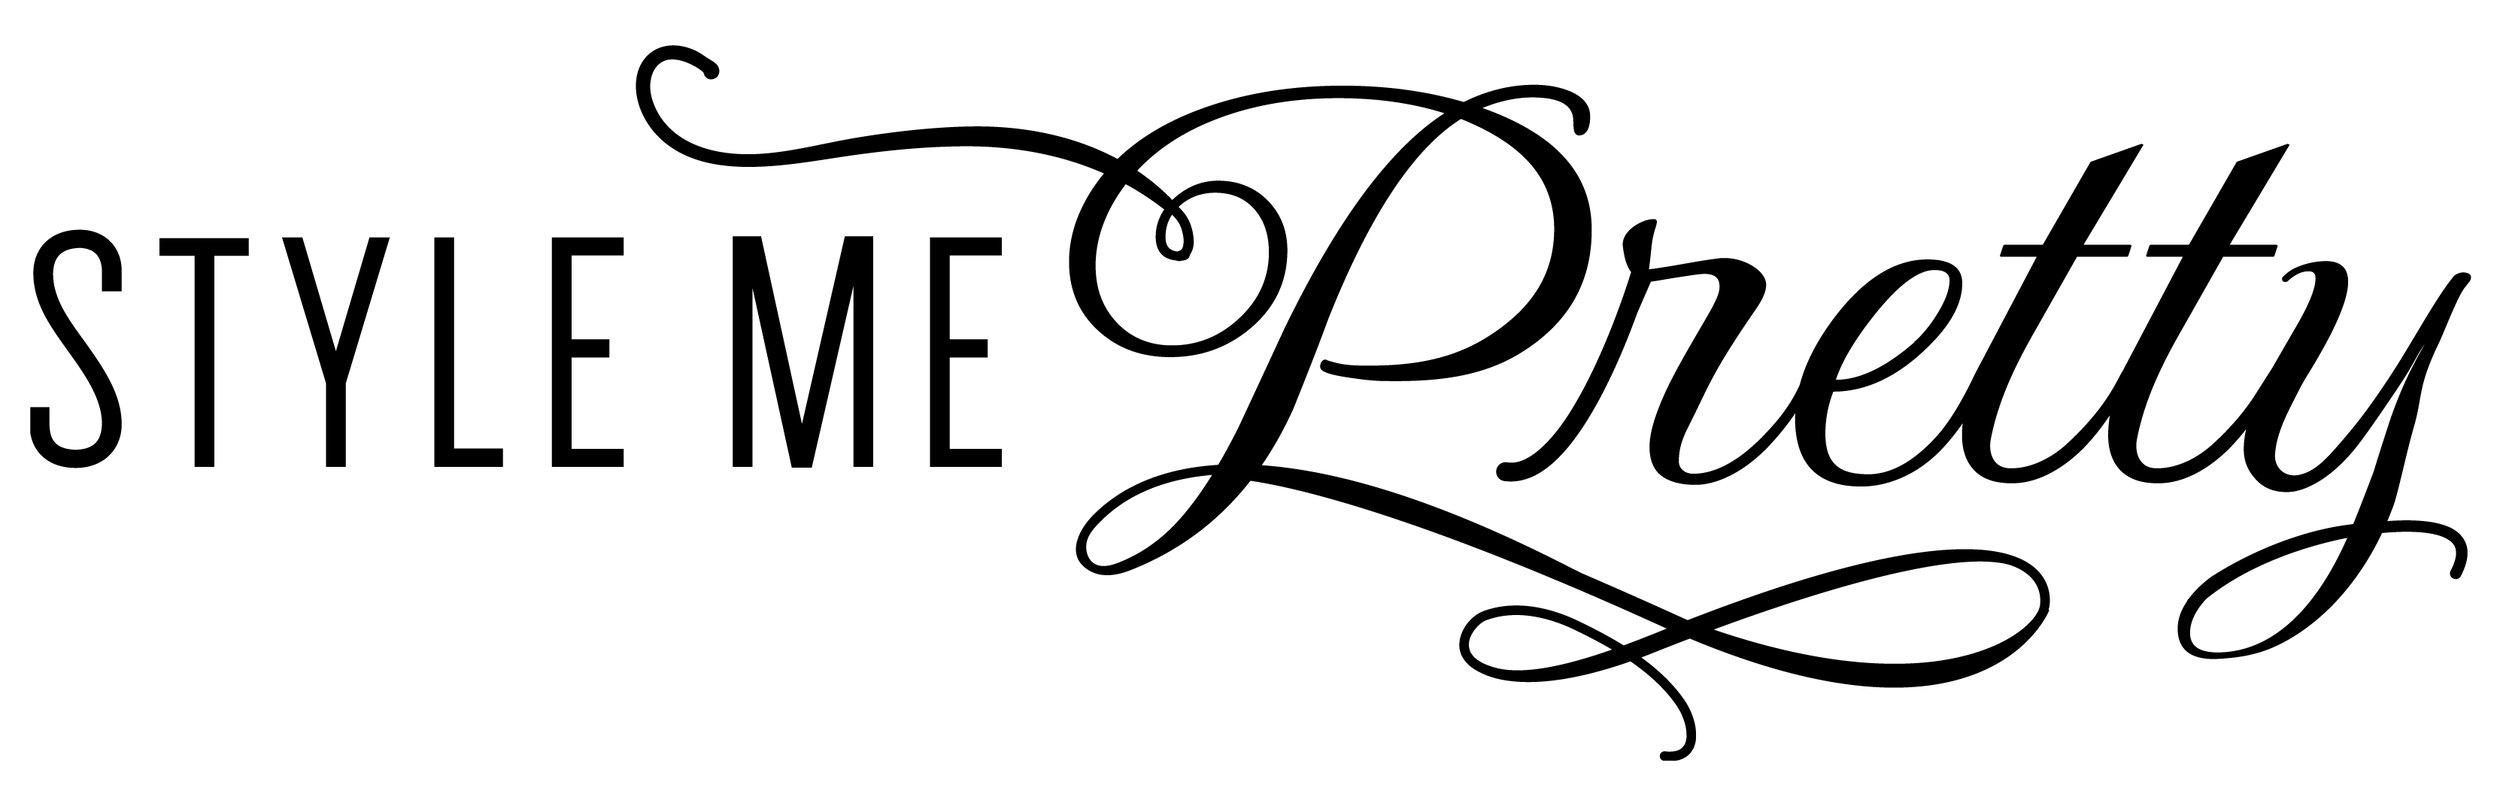 style my pretty logo